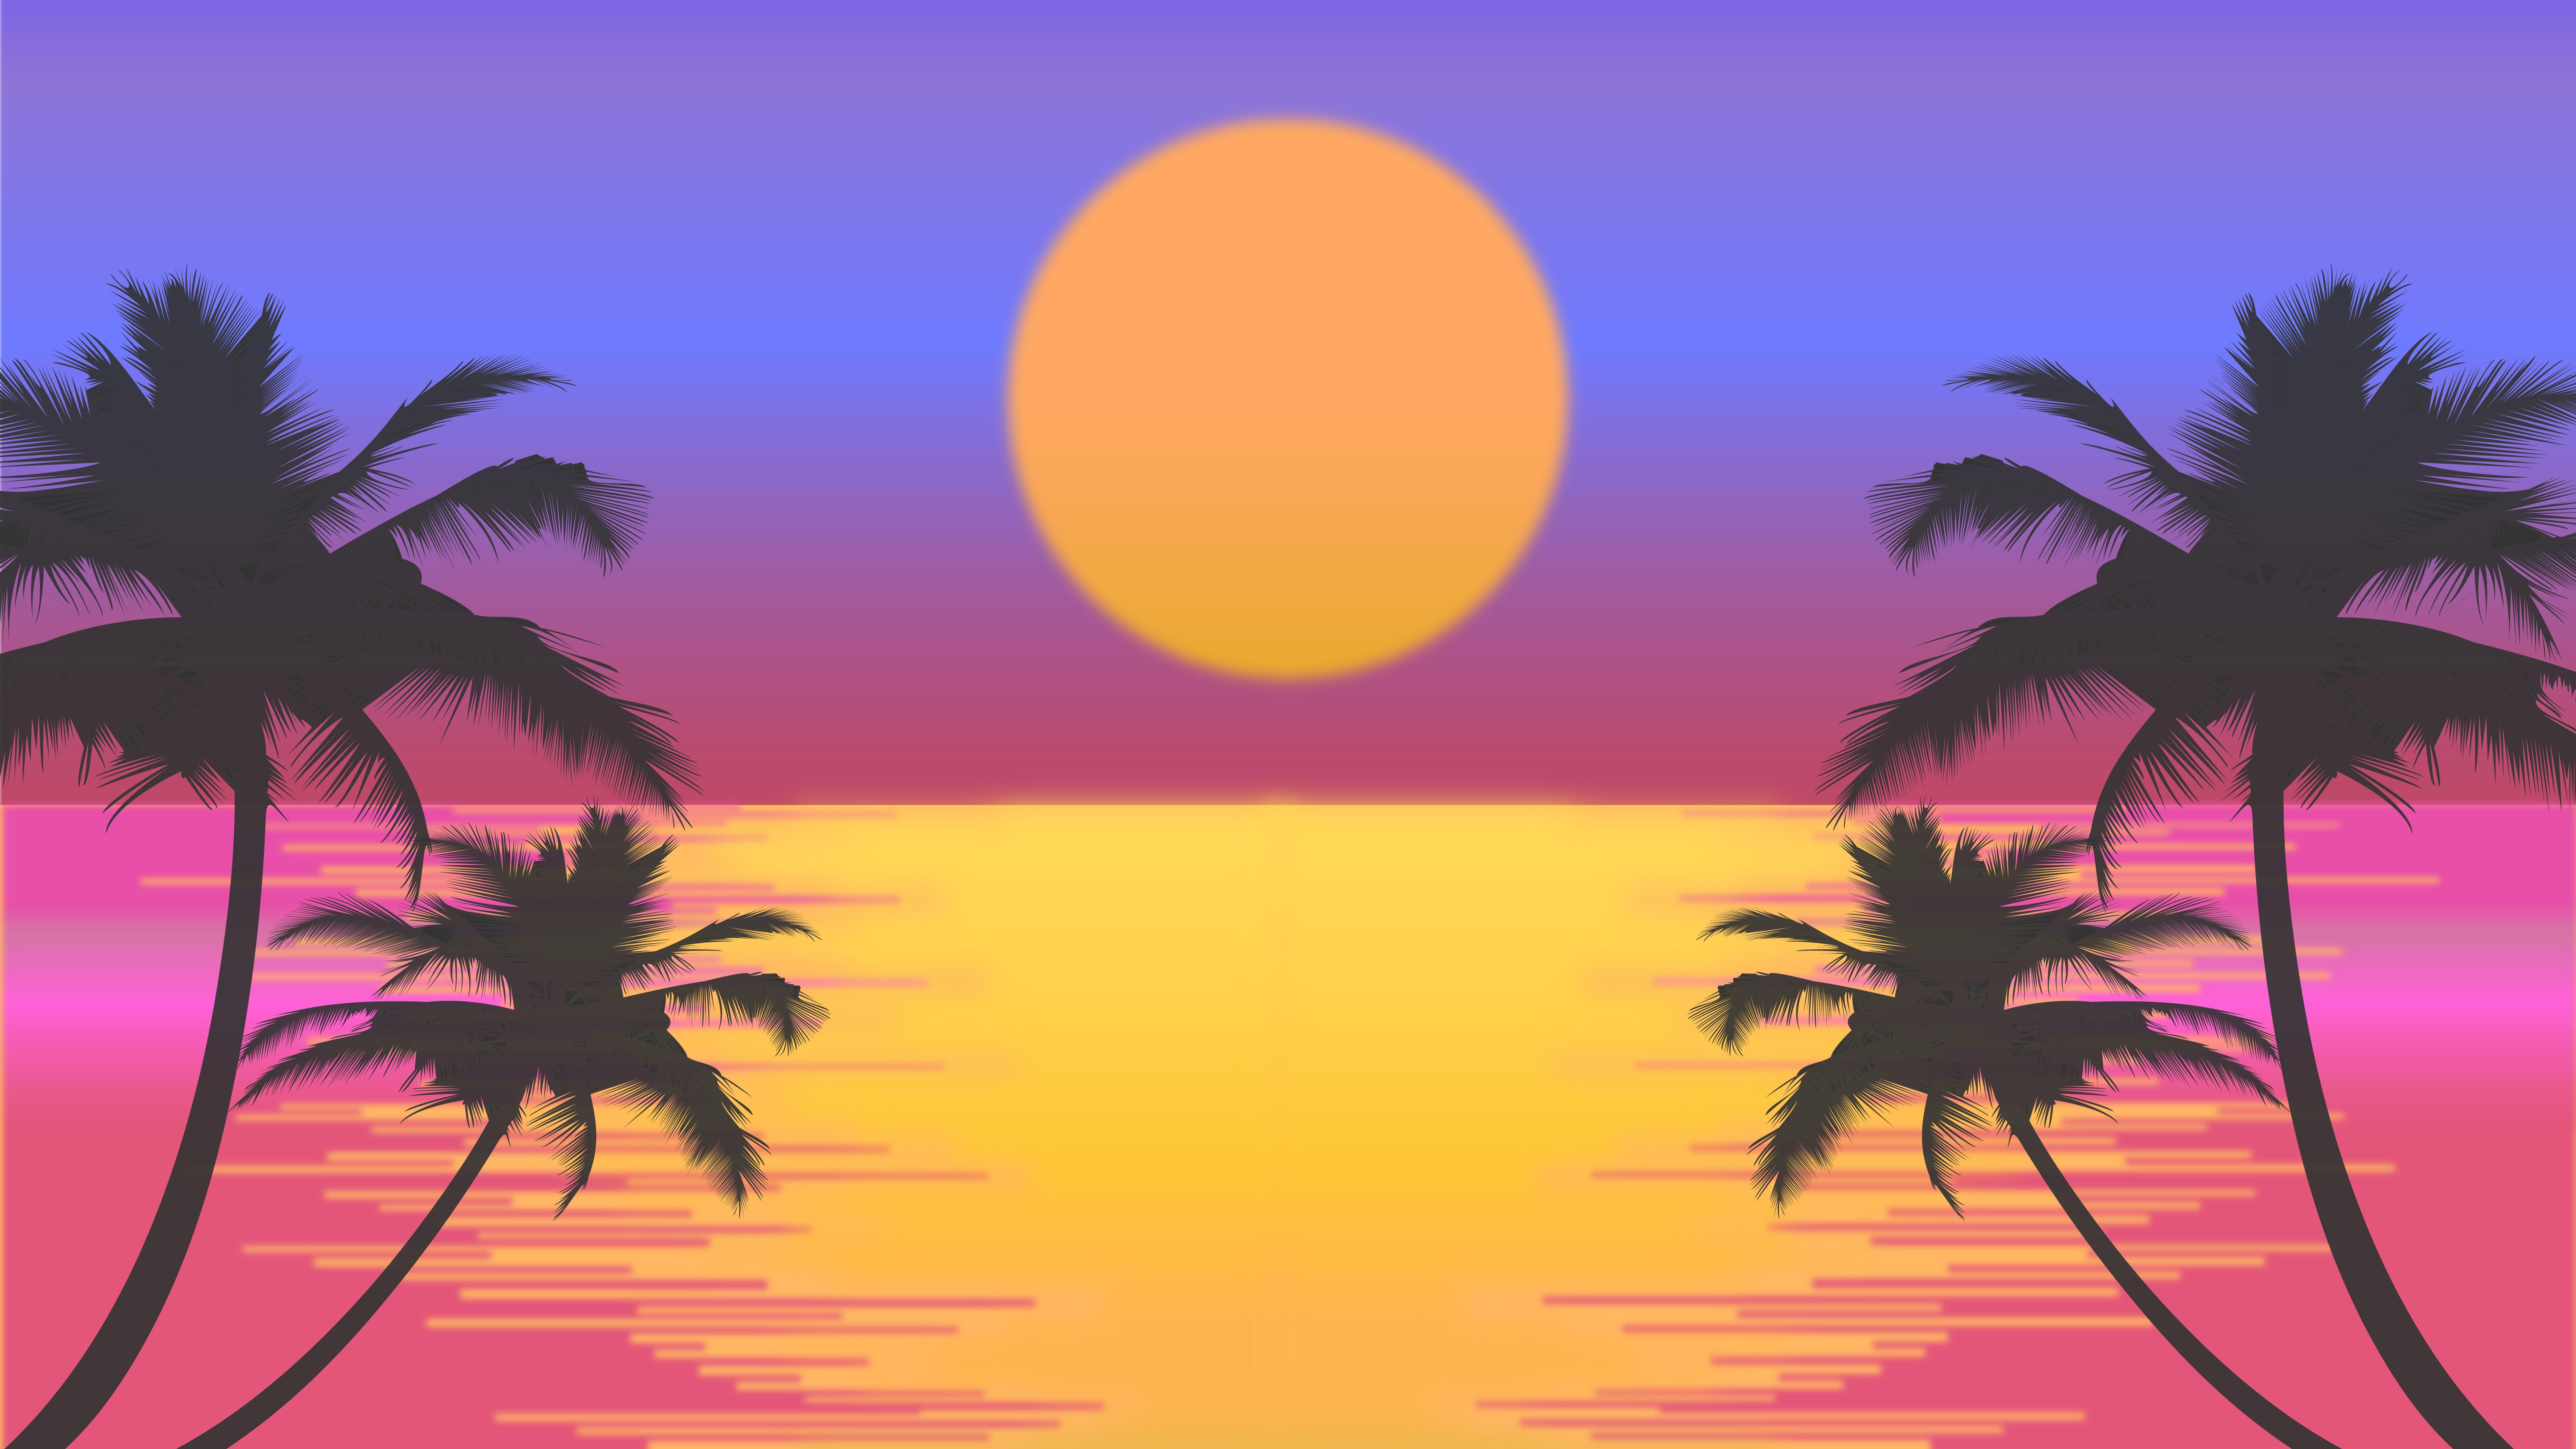 7680x4320 Palm Trees Sun Vector Artwork 8k 8k HD 4k ...